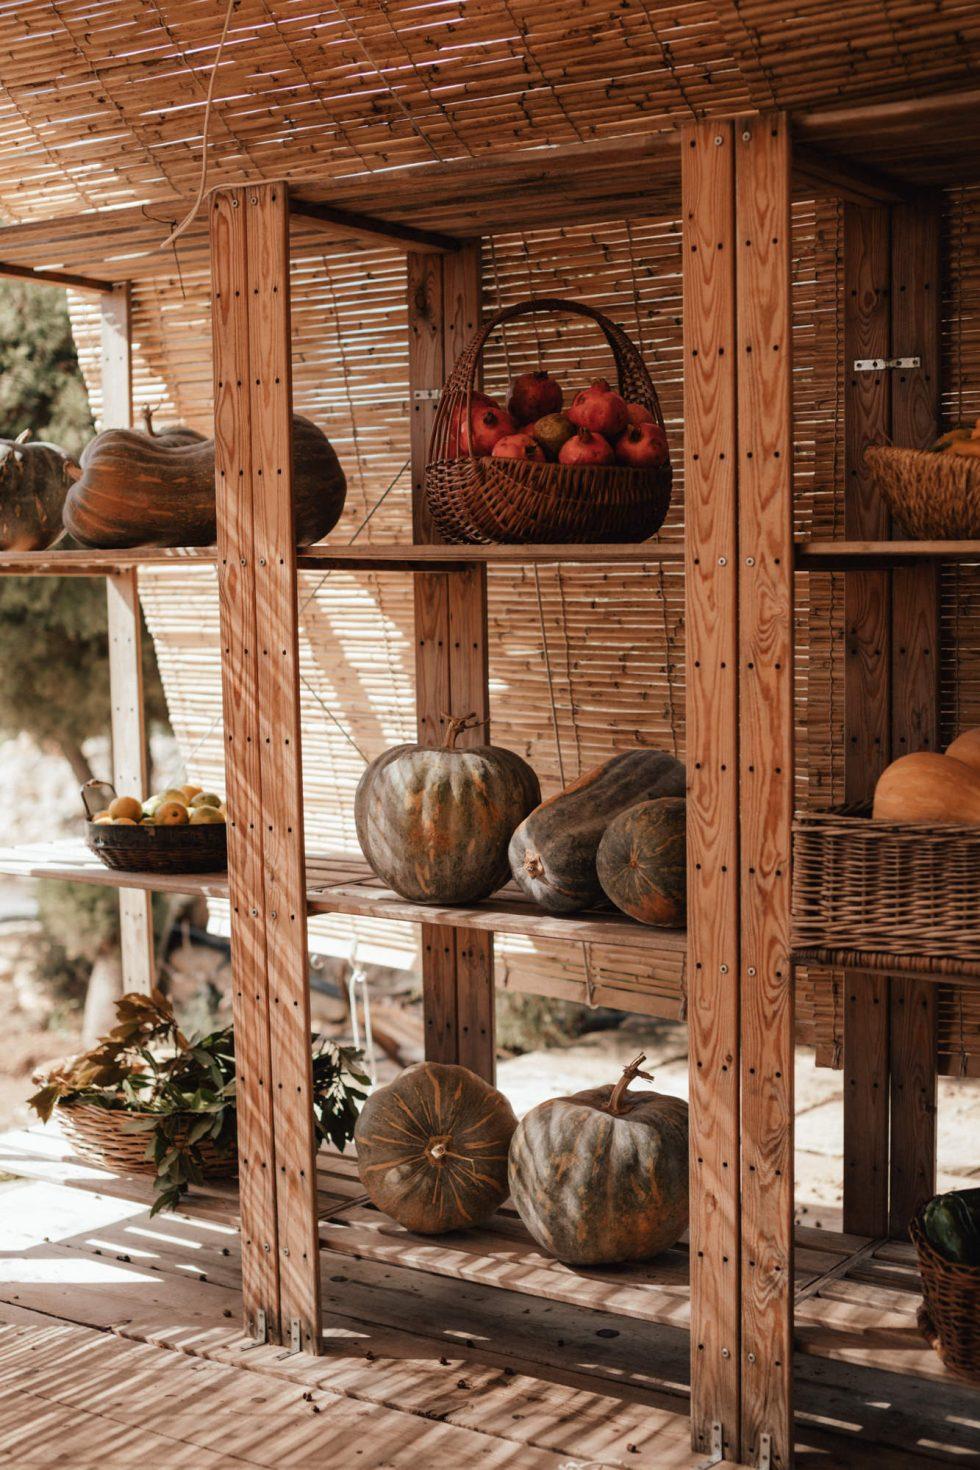 malta-travel-sustainable-farm-lifestyle-photographer-laura-g-diaz-3